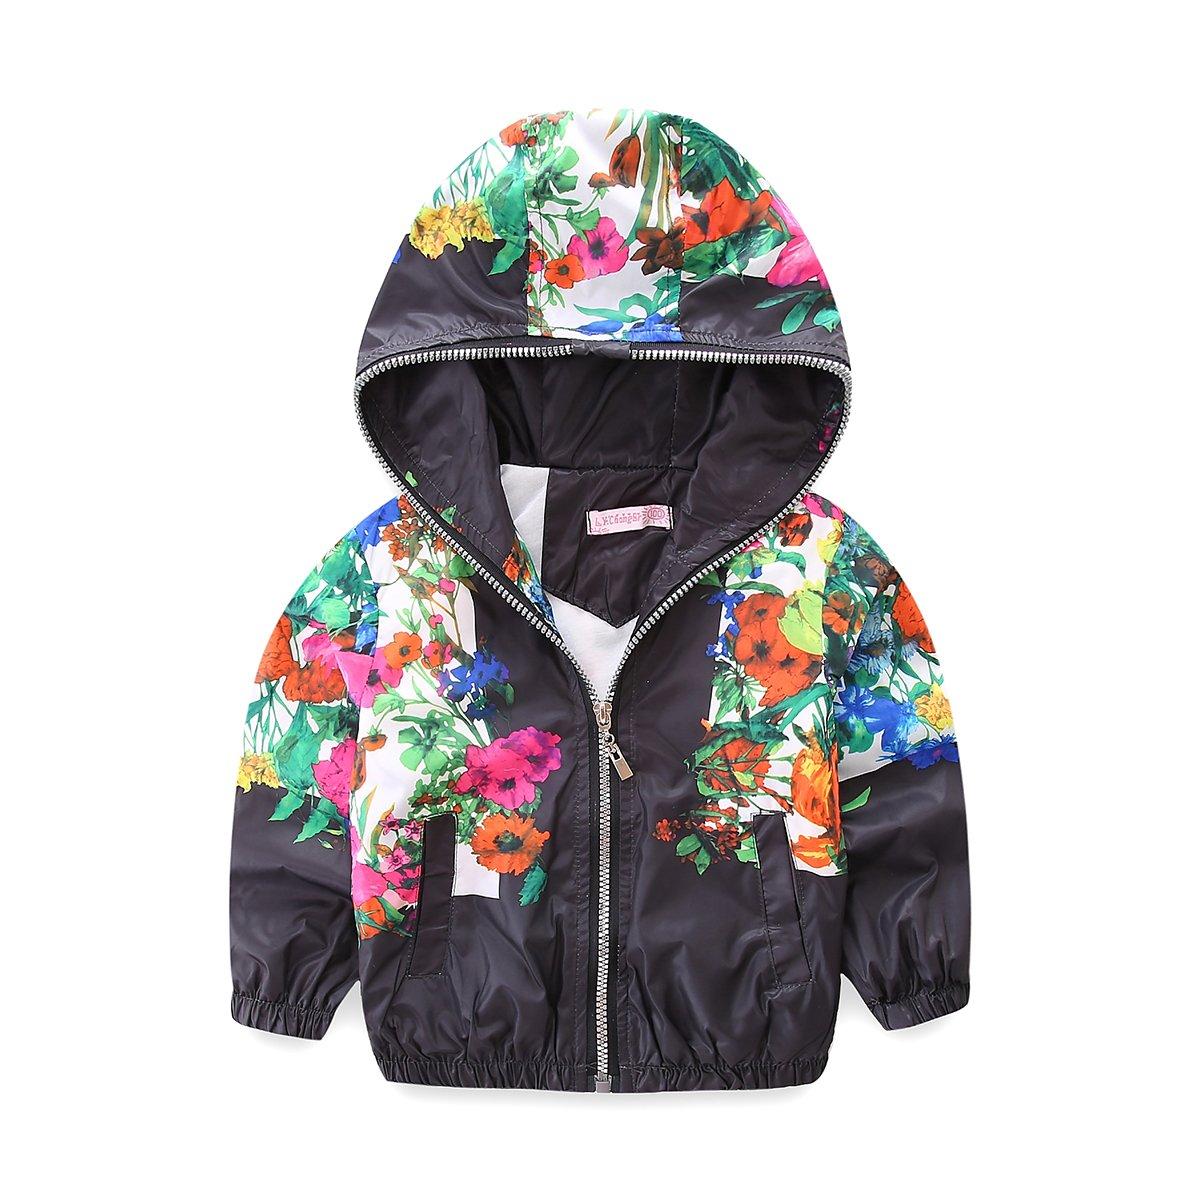 28af678d5da1 Amazon.com  Mud Kingdom Little Girls Jackets Floral with Hood Thin ...